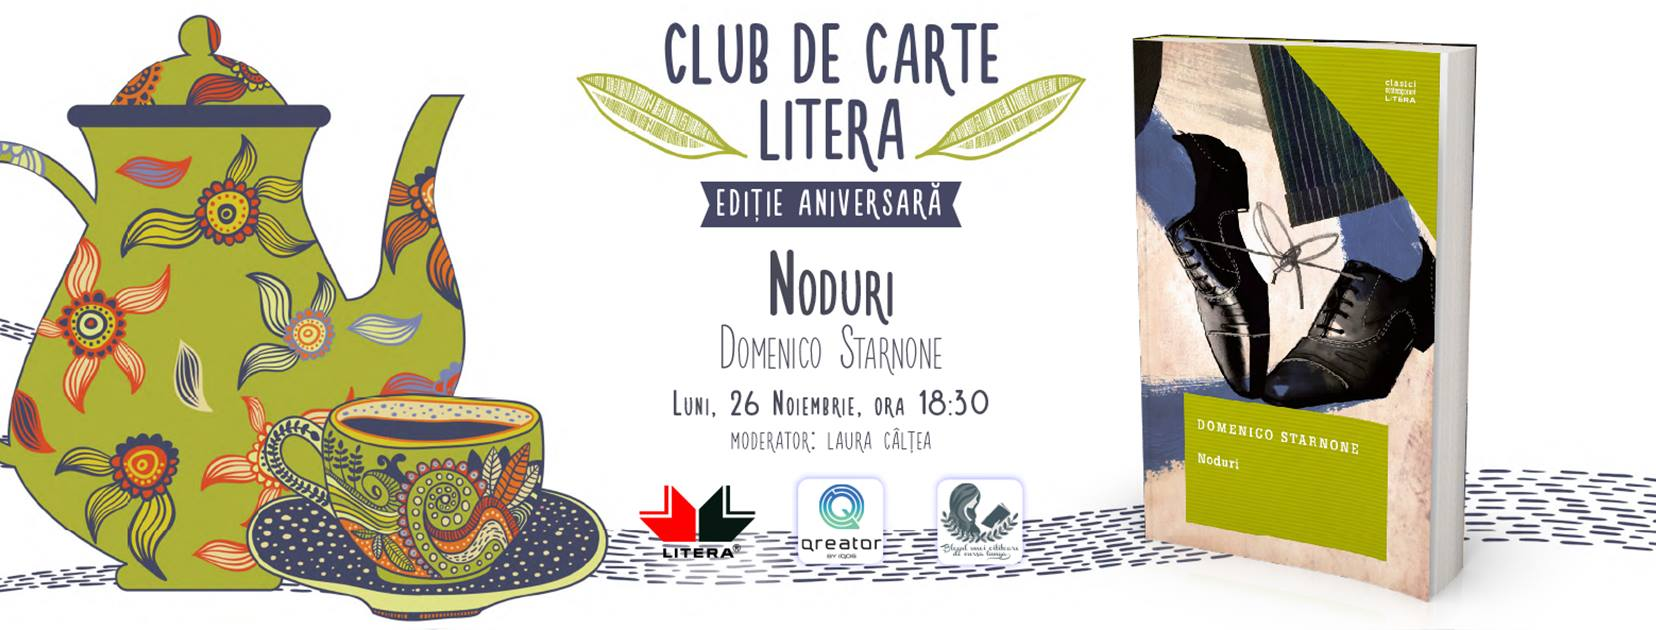 "Club de carte aniversar #48: ""Noduri"", de Domenico Starnone"